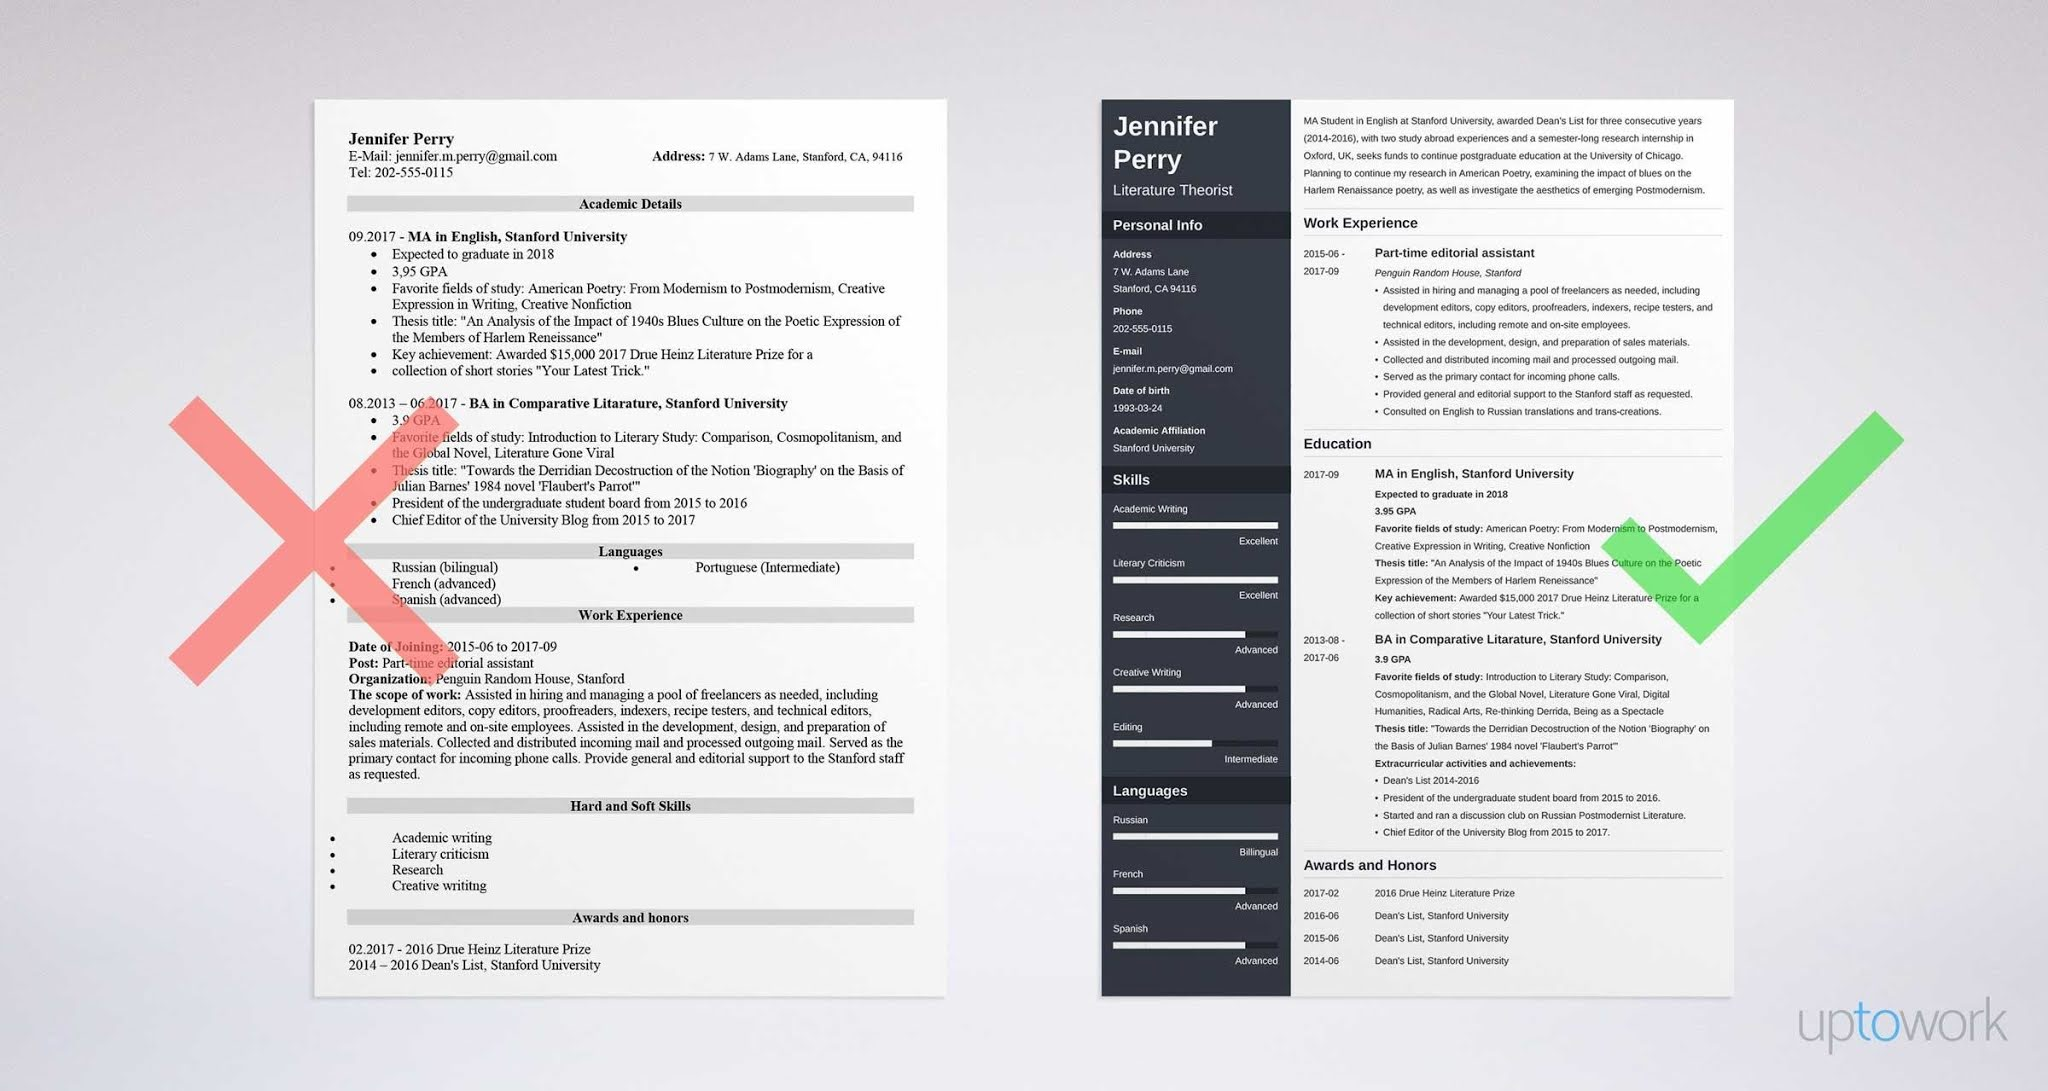 Contoh CV Untuk Beasiswa Kuliah Dalam Bahasa Inggris